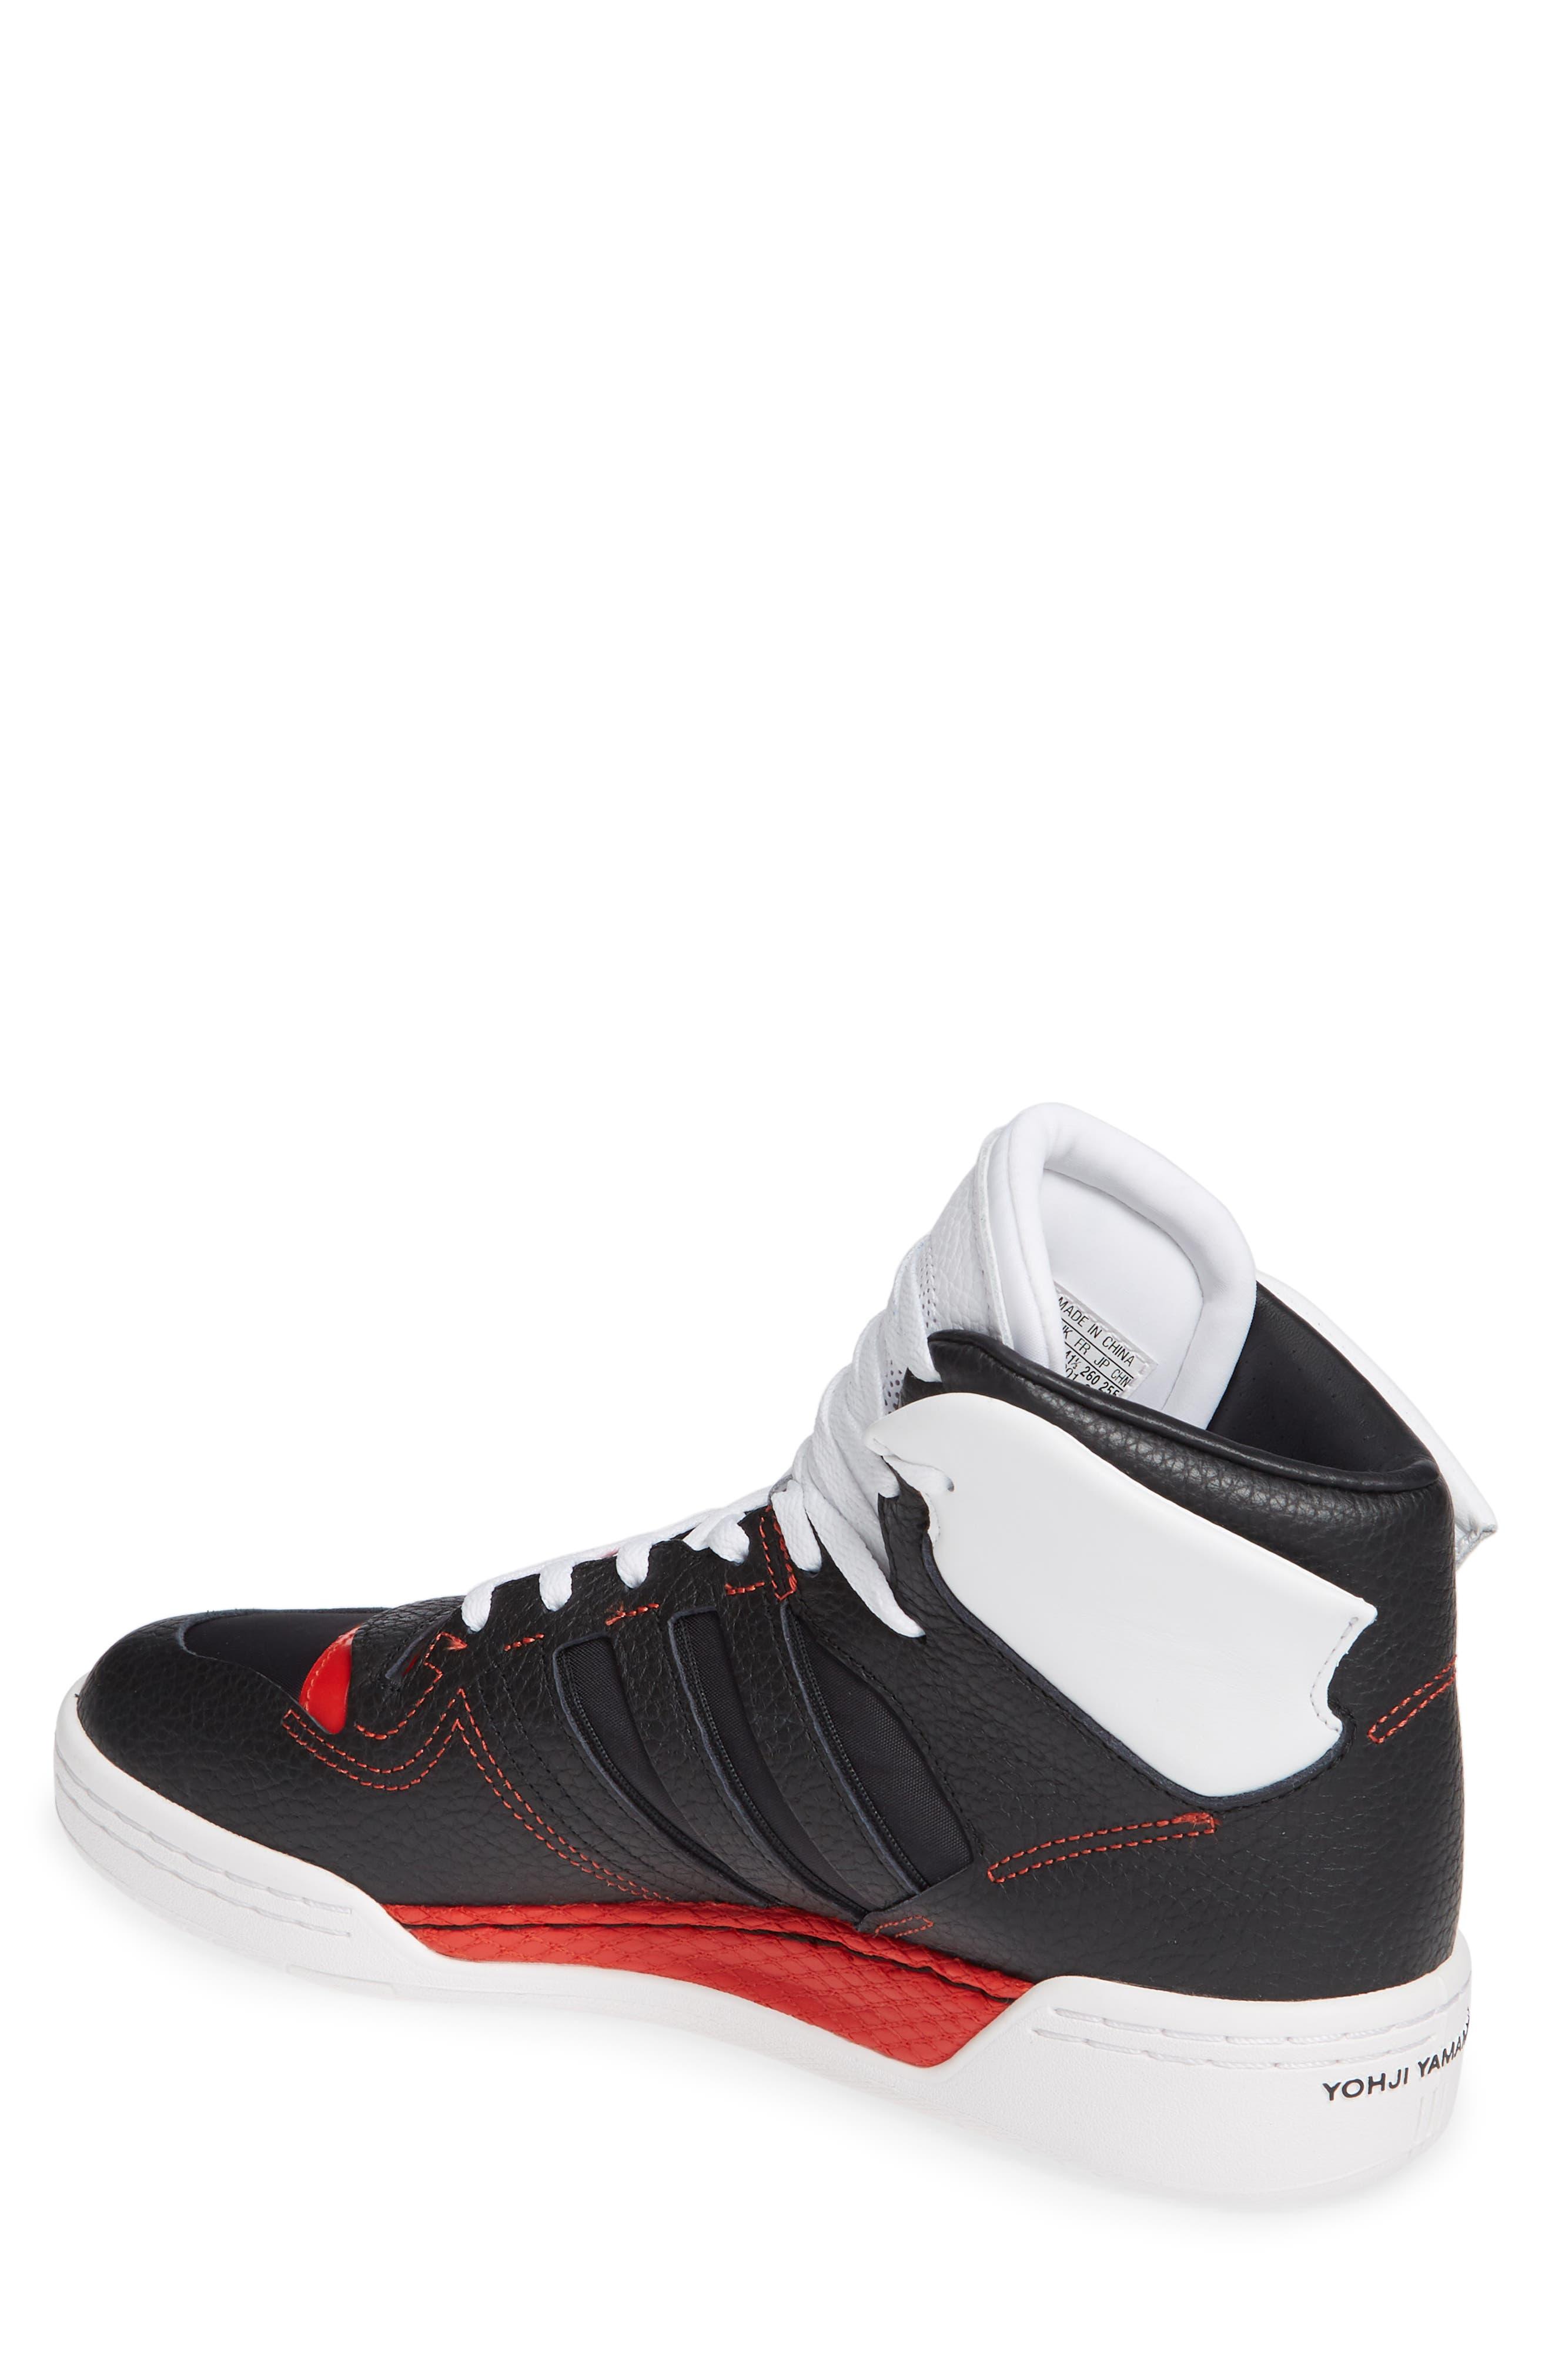 Y-3,                             x adidas Hayworth High Top Sneaker,                             Alternate thumbnail 2, color,                             BLACK/ BLACK/ RED